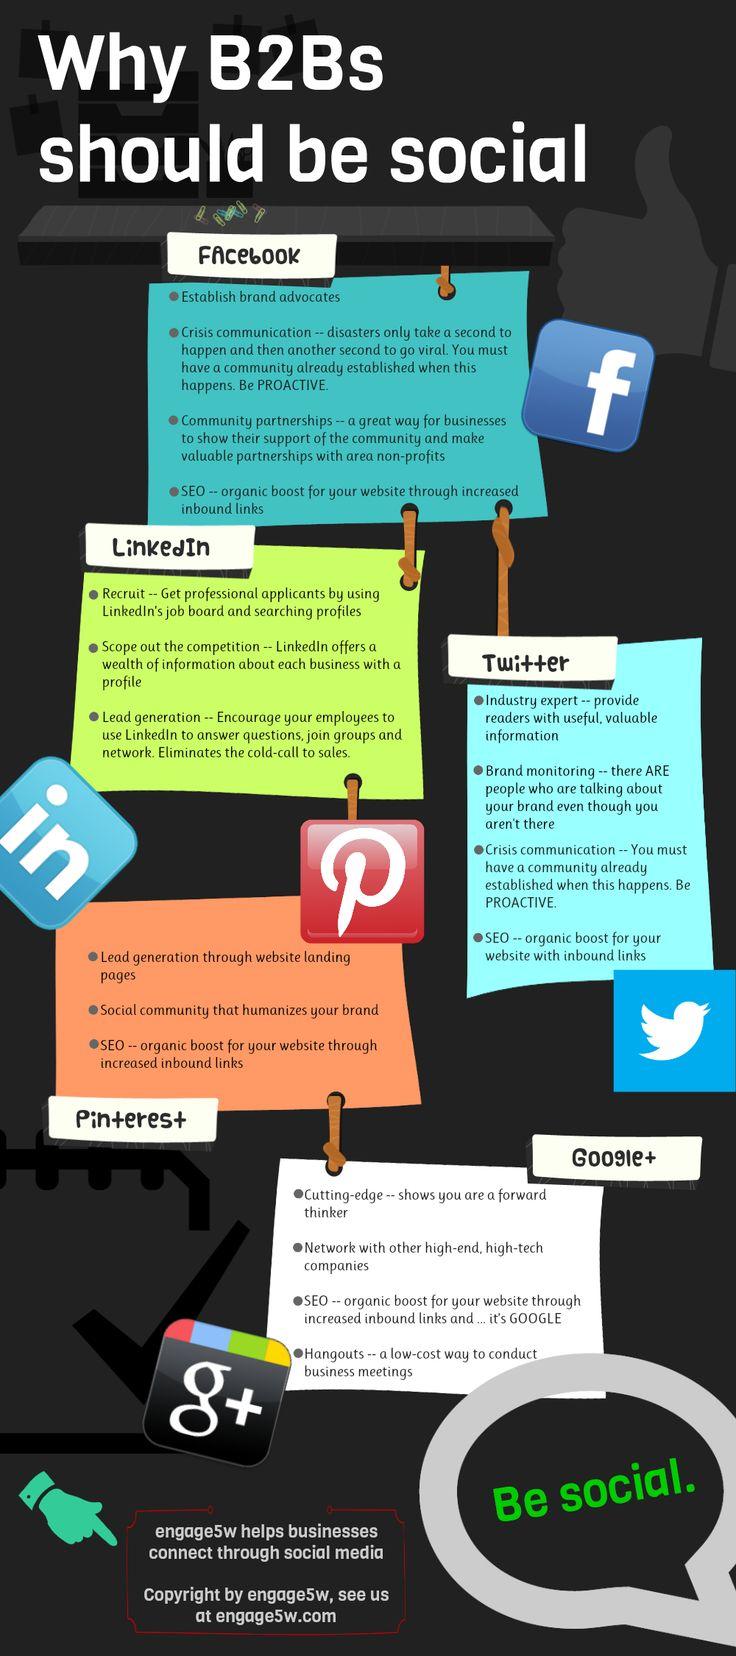 Why #B2B s Should Be Social #Facebook #LinkedIn #Twitter #Pinterest #Google+